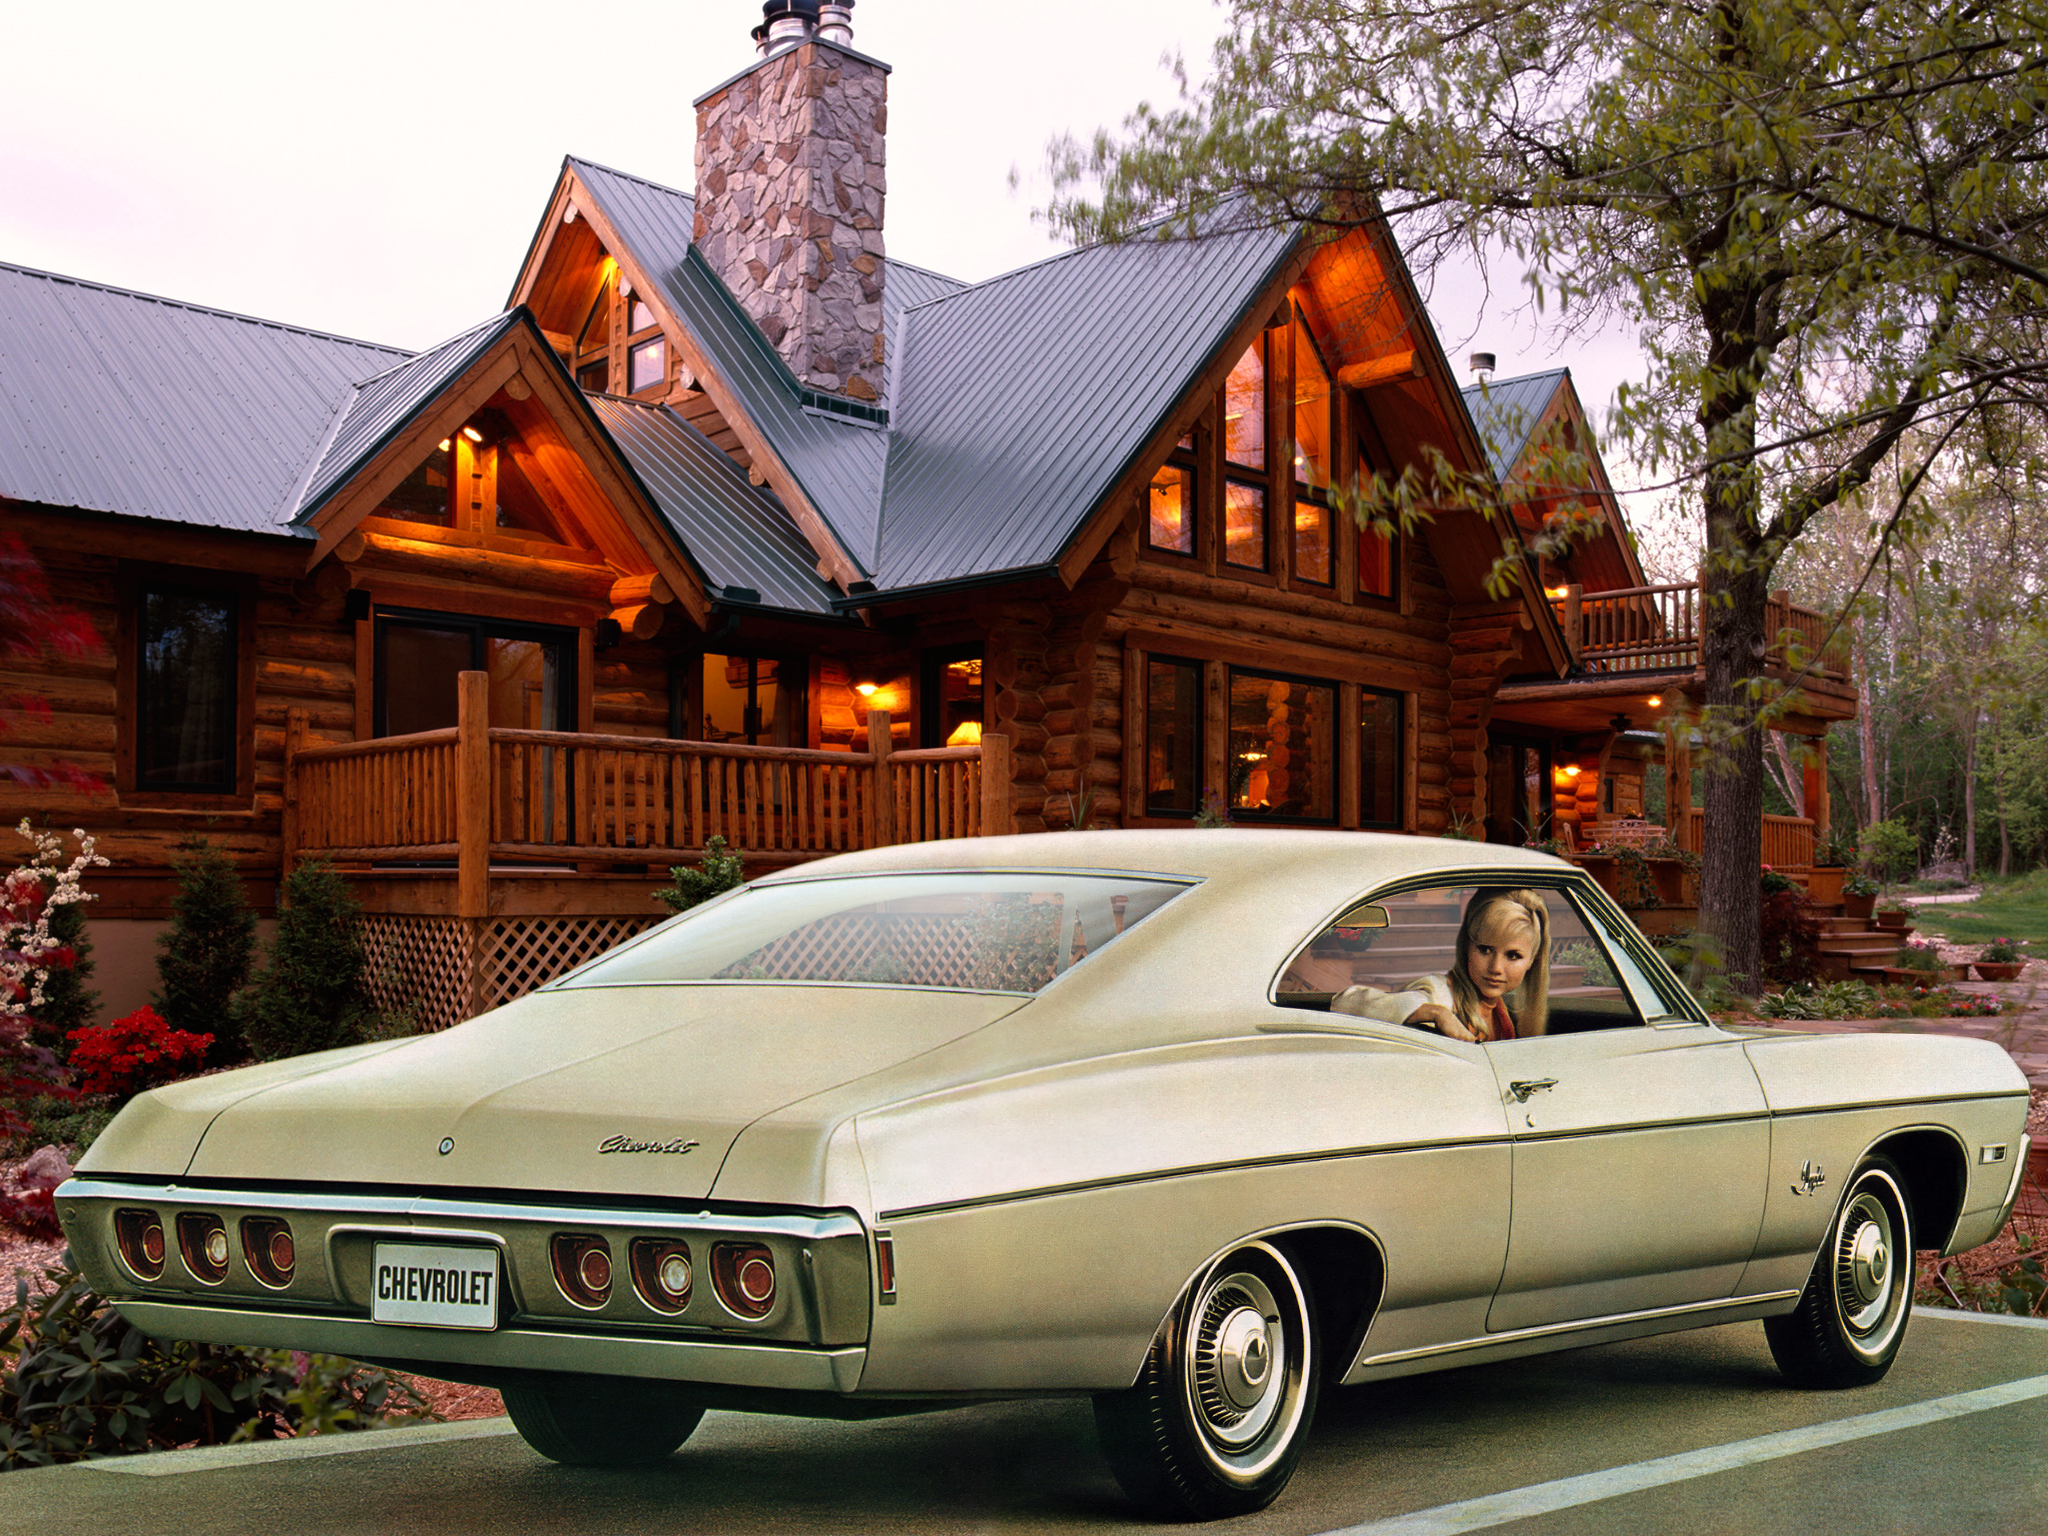 1968-chevrolet_impala-04.jpeg